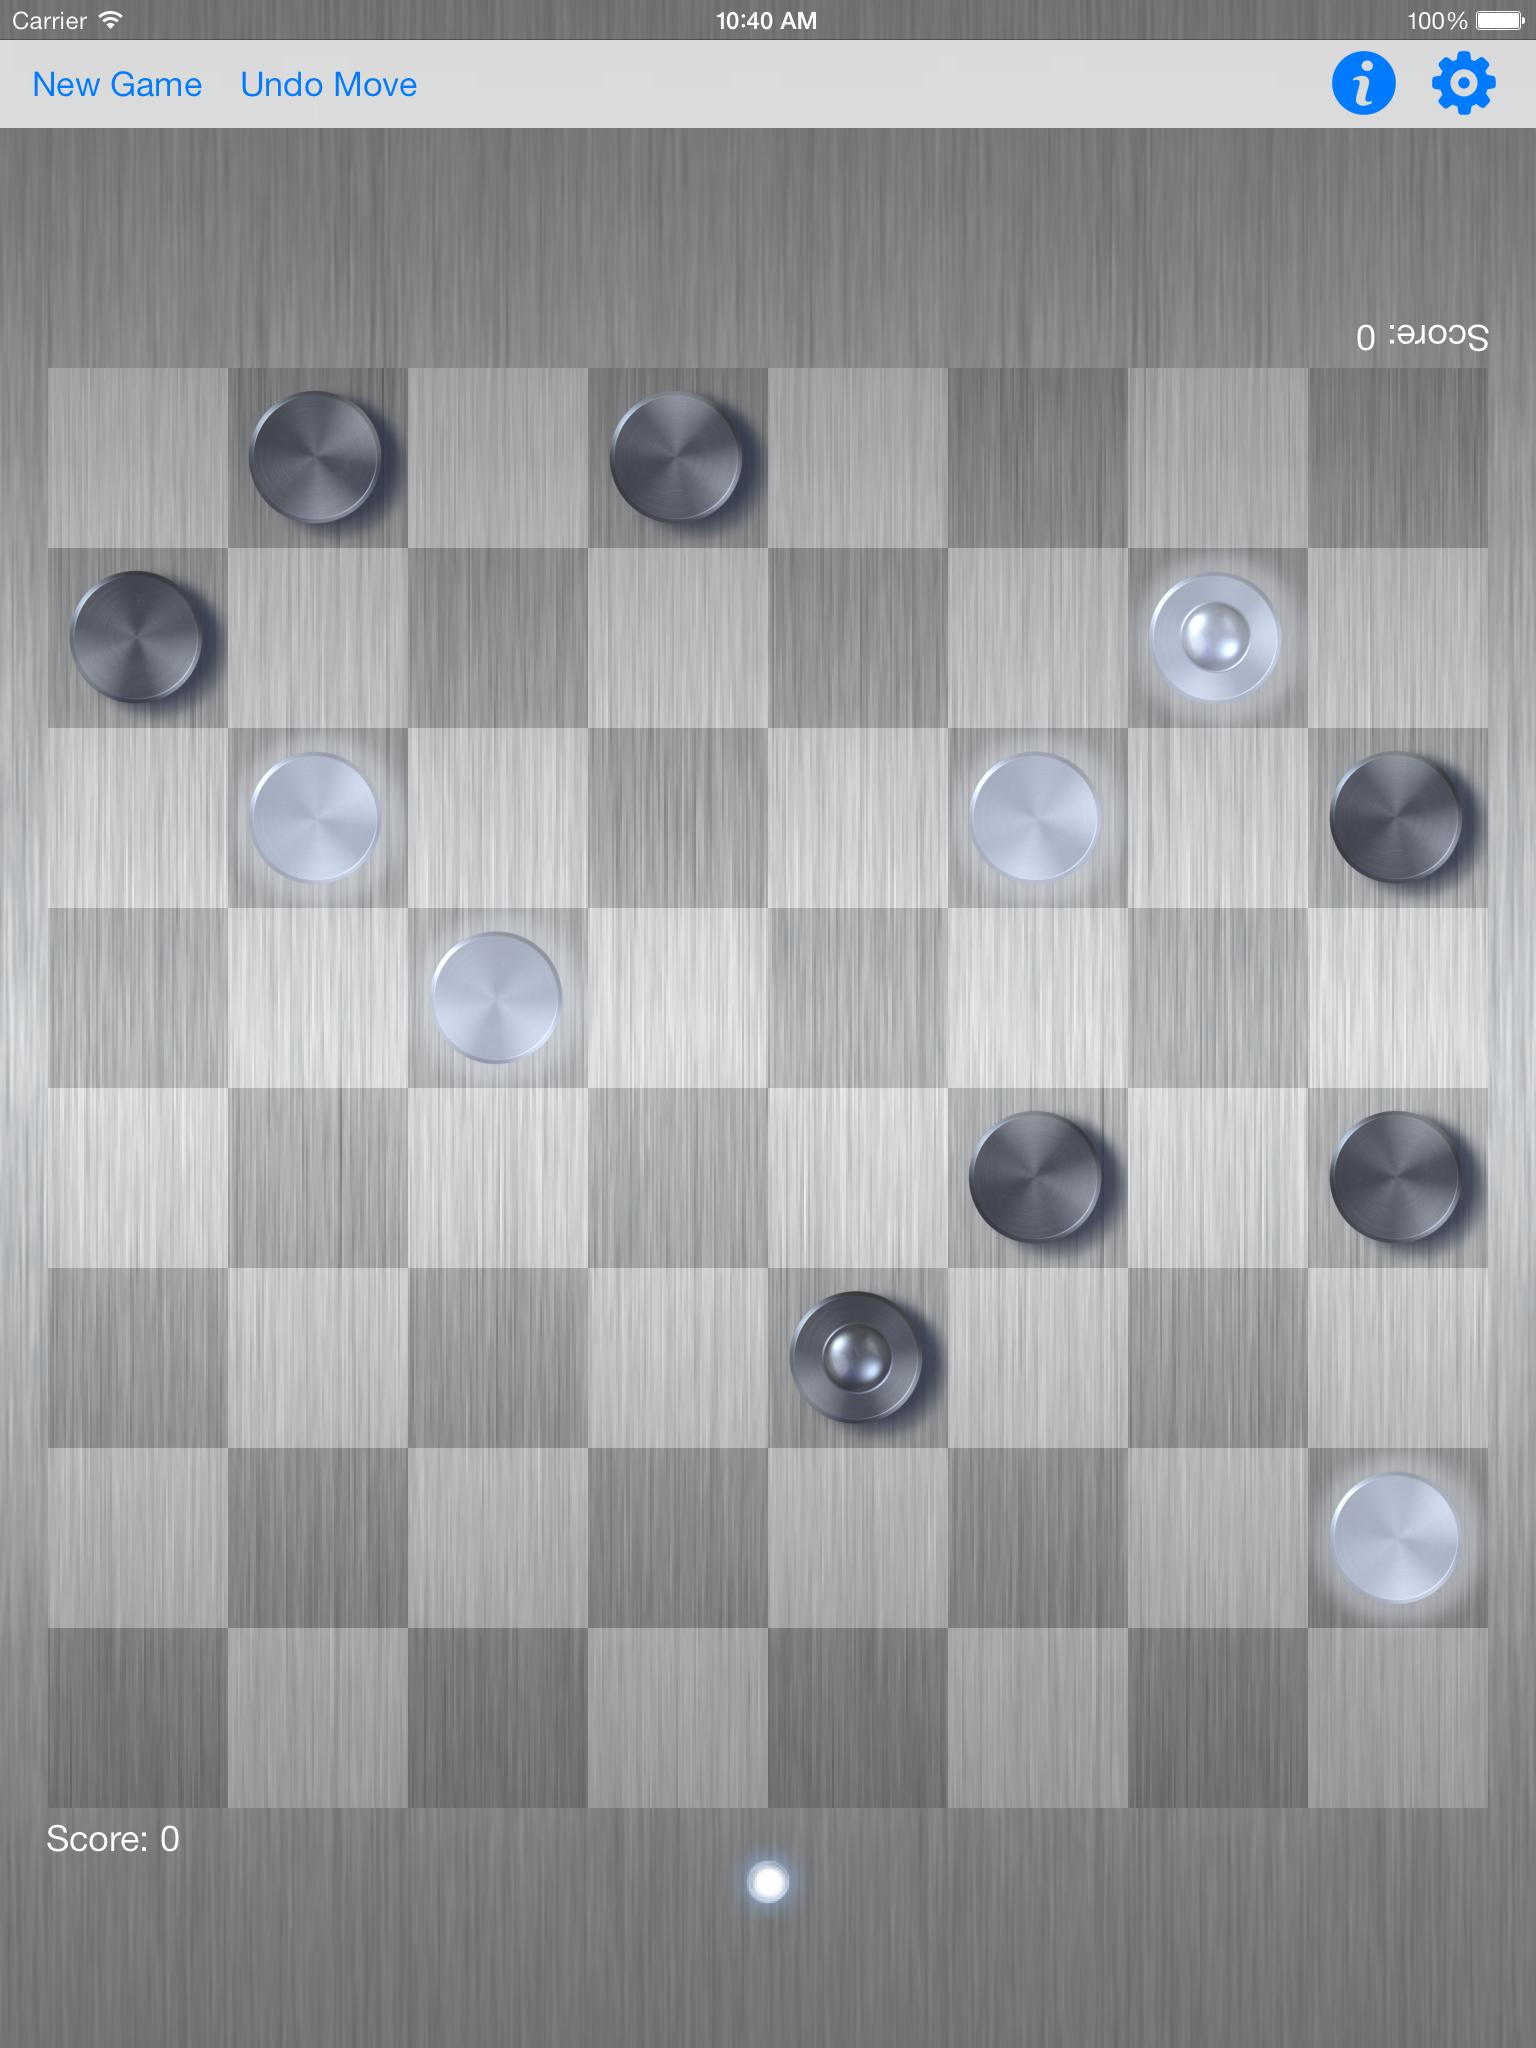 iOS Simulator Screen shot Oct 15, 2013, 10.40.44 AM.png